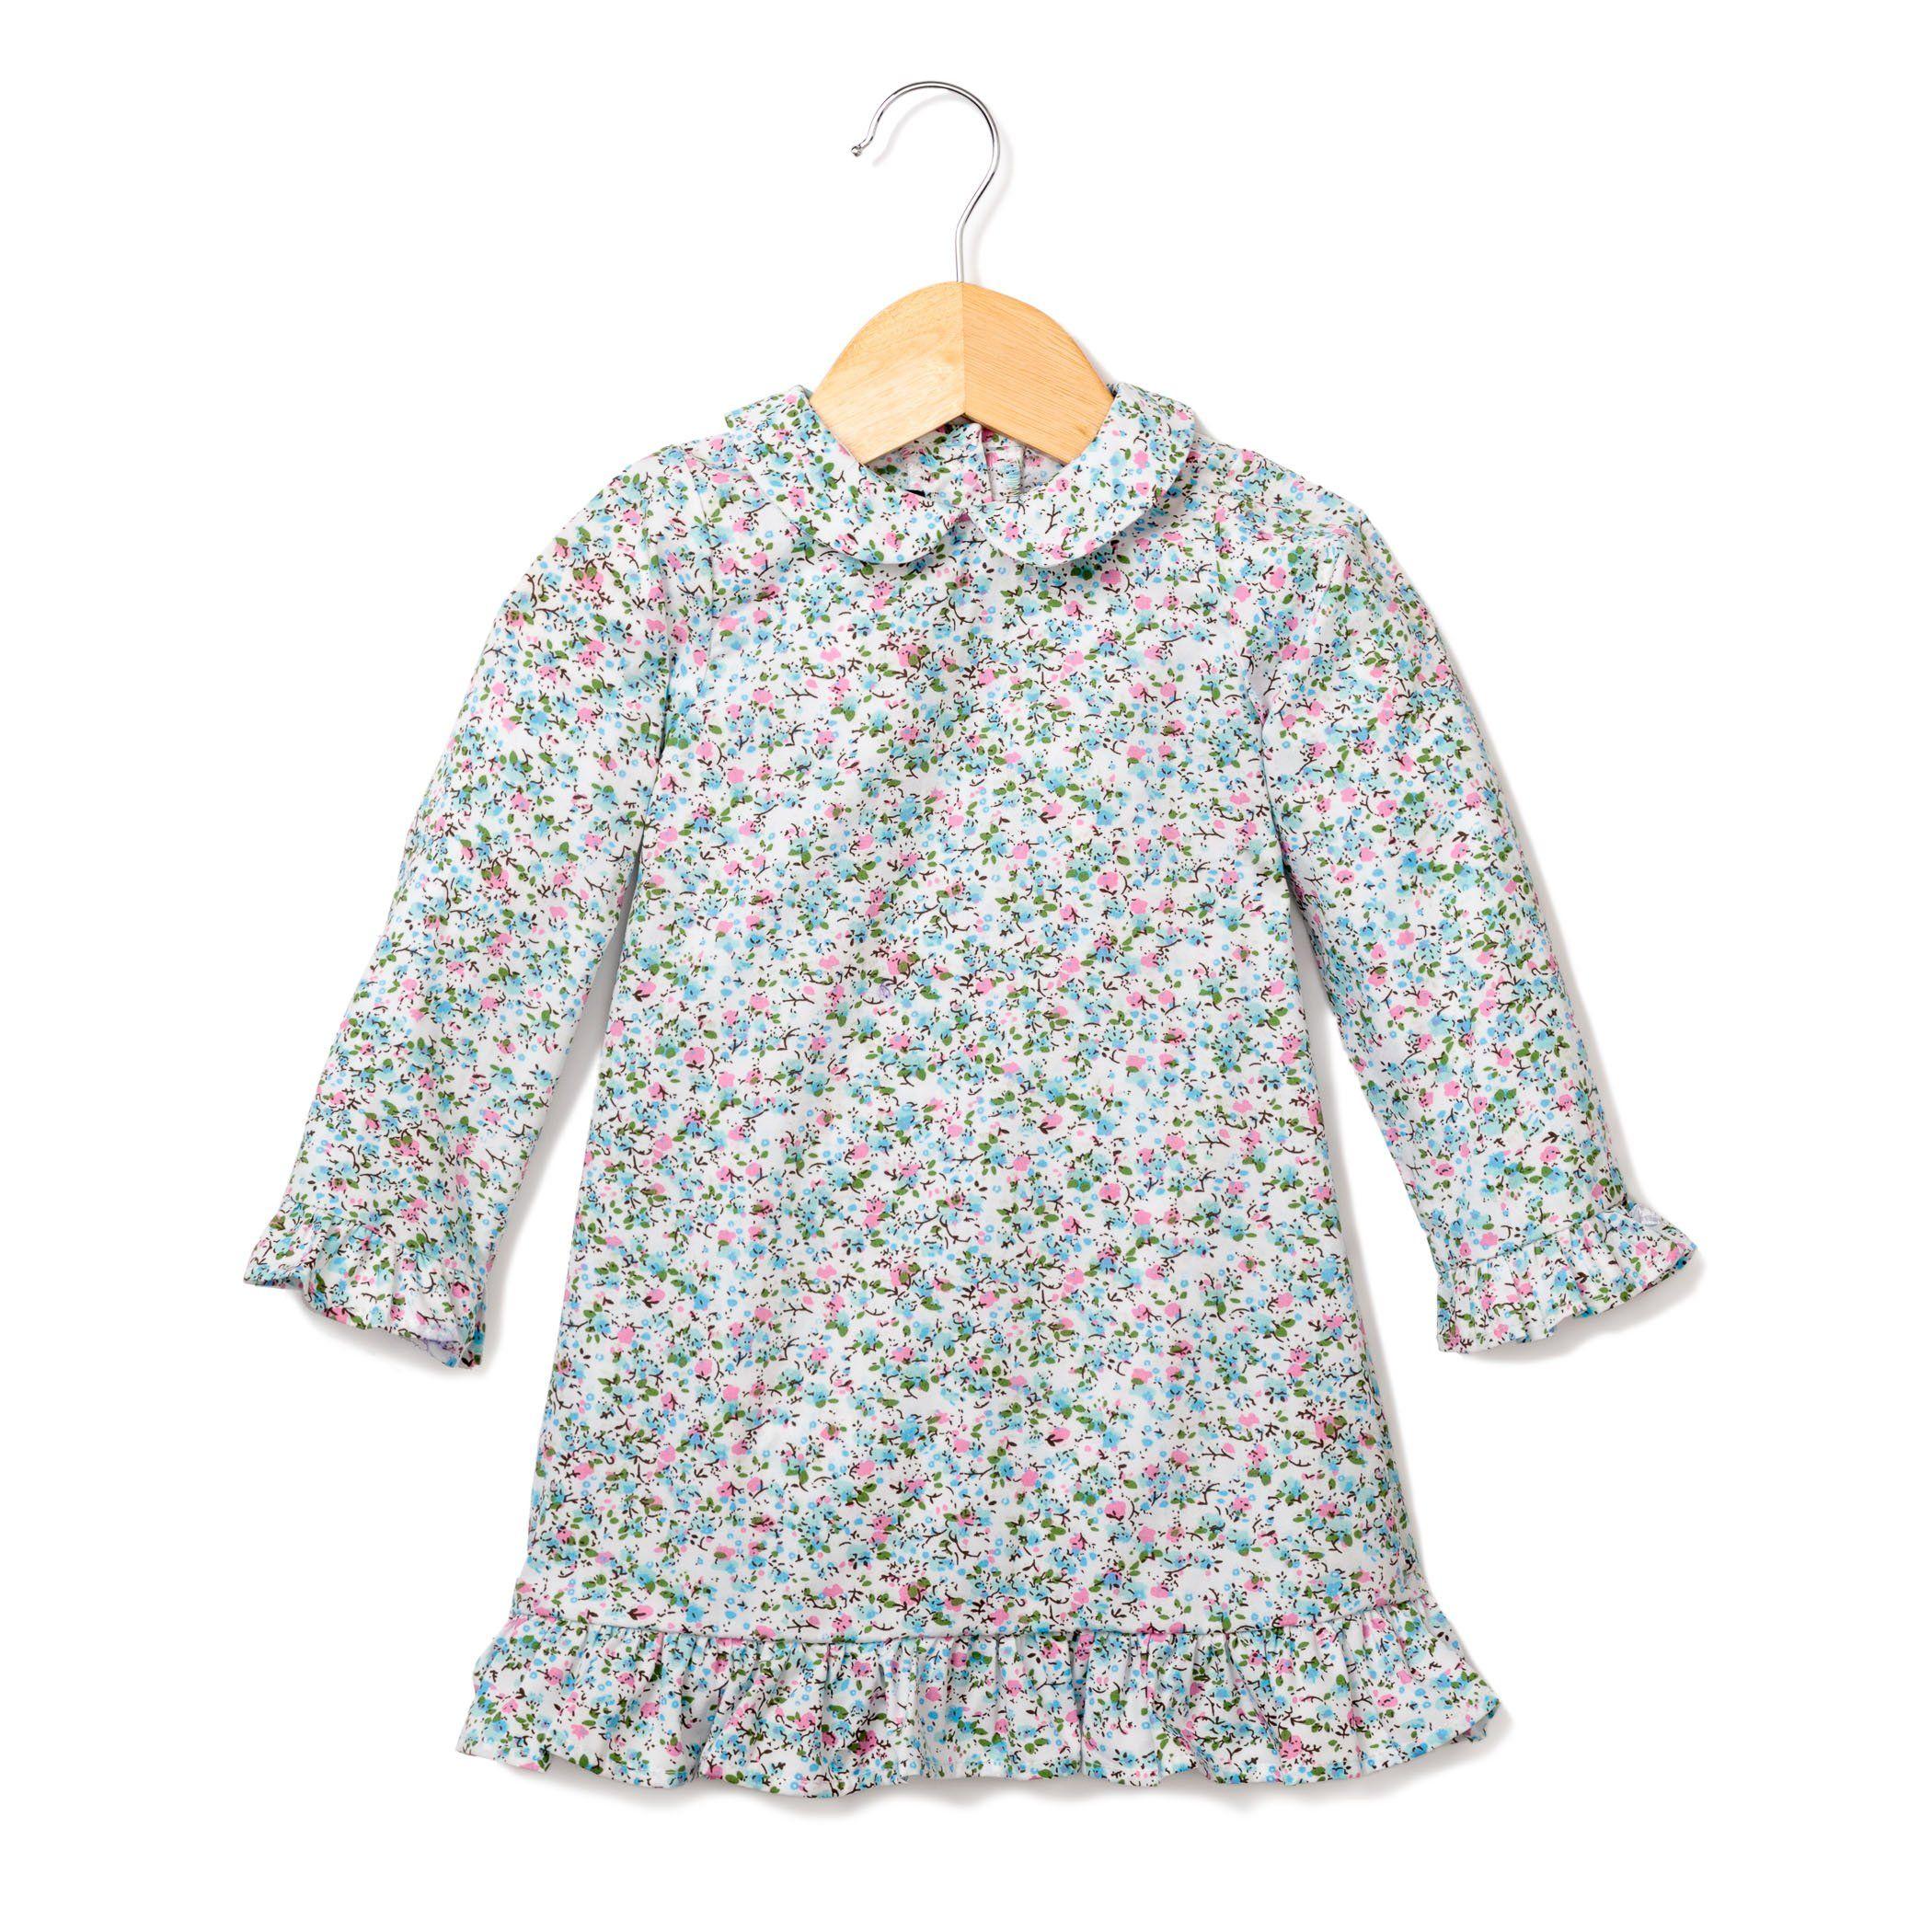 Floral Whisper Sophia Nightgown from Petite Plume #kids #sleepwear ...